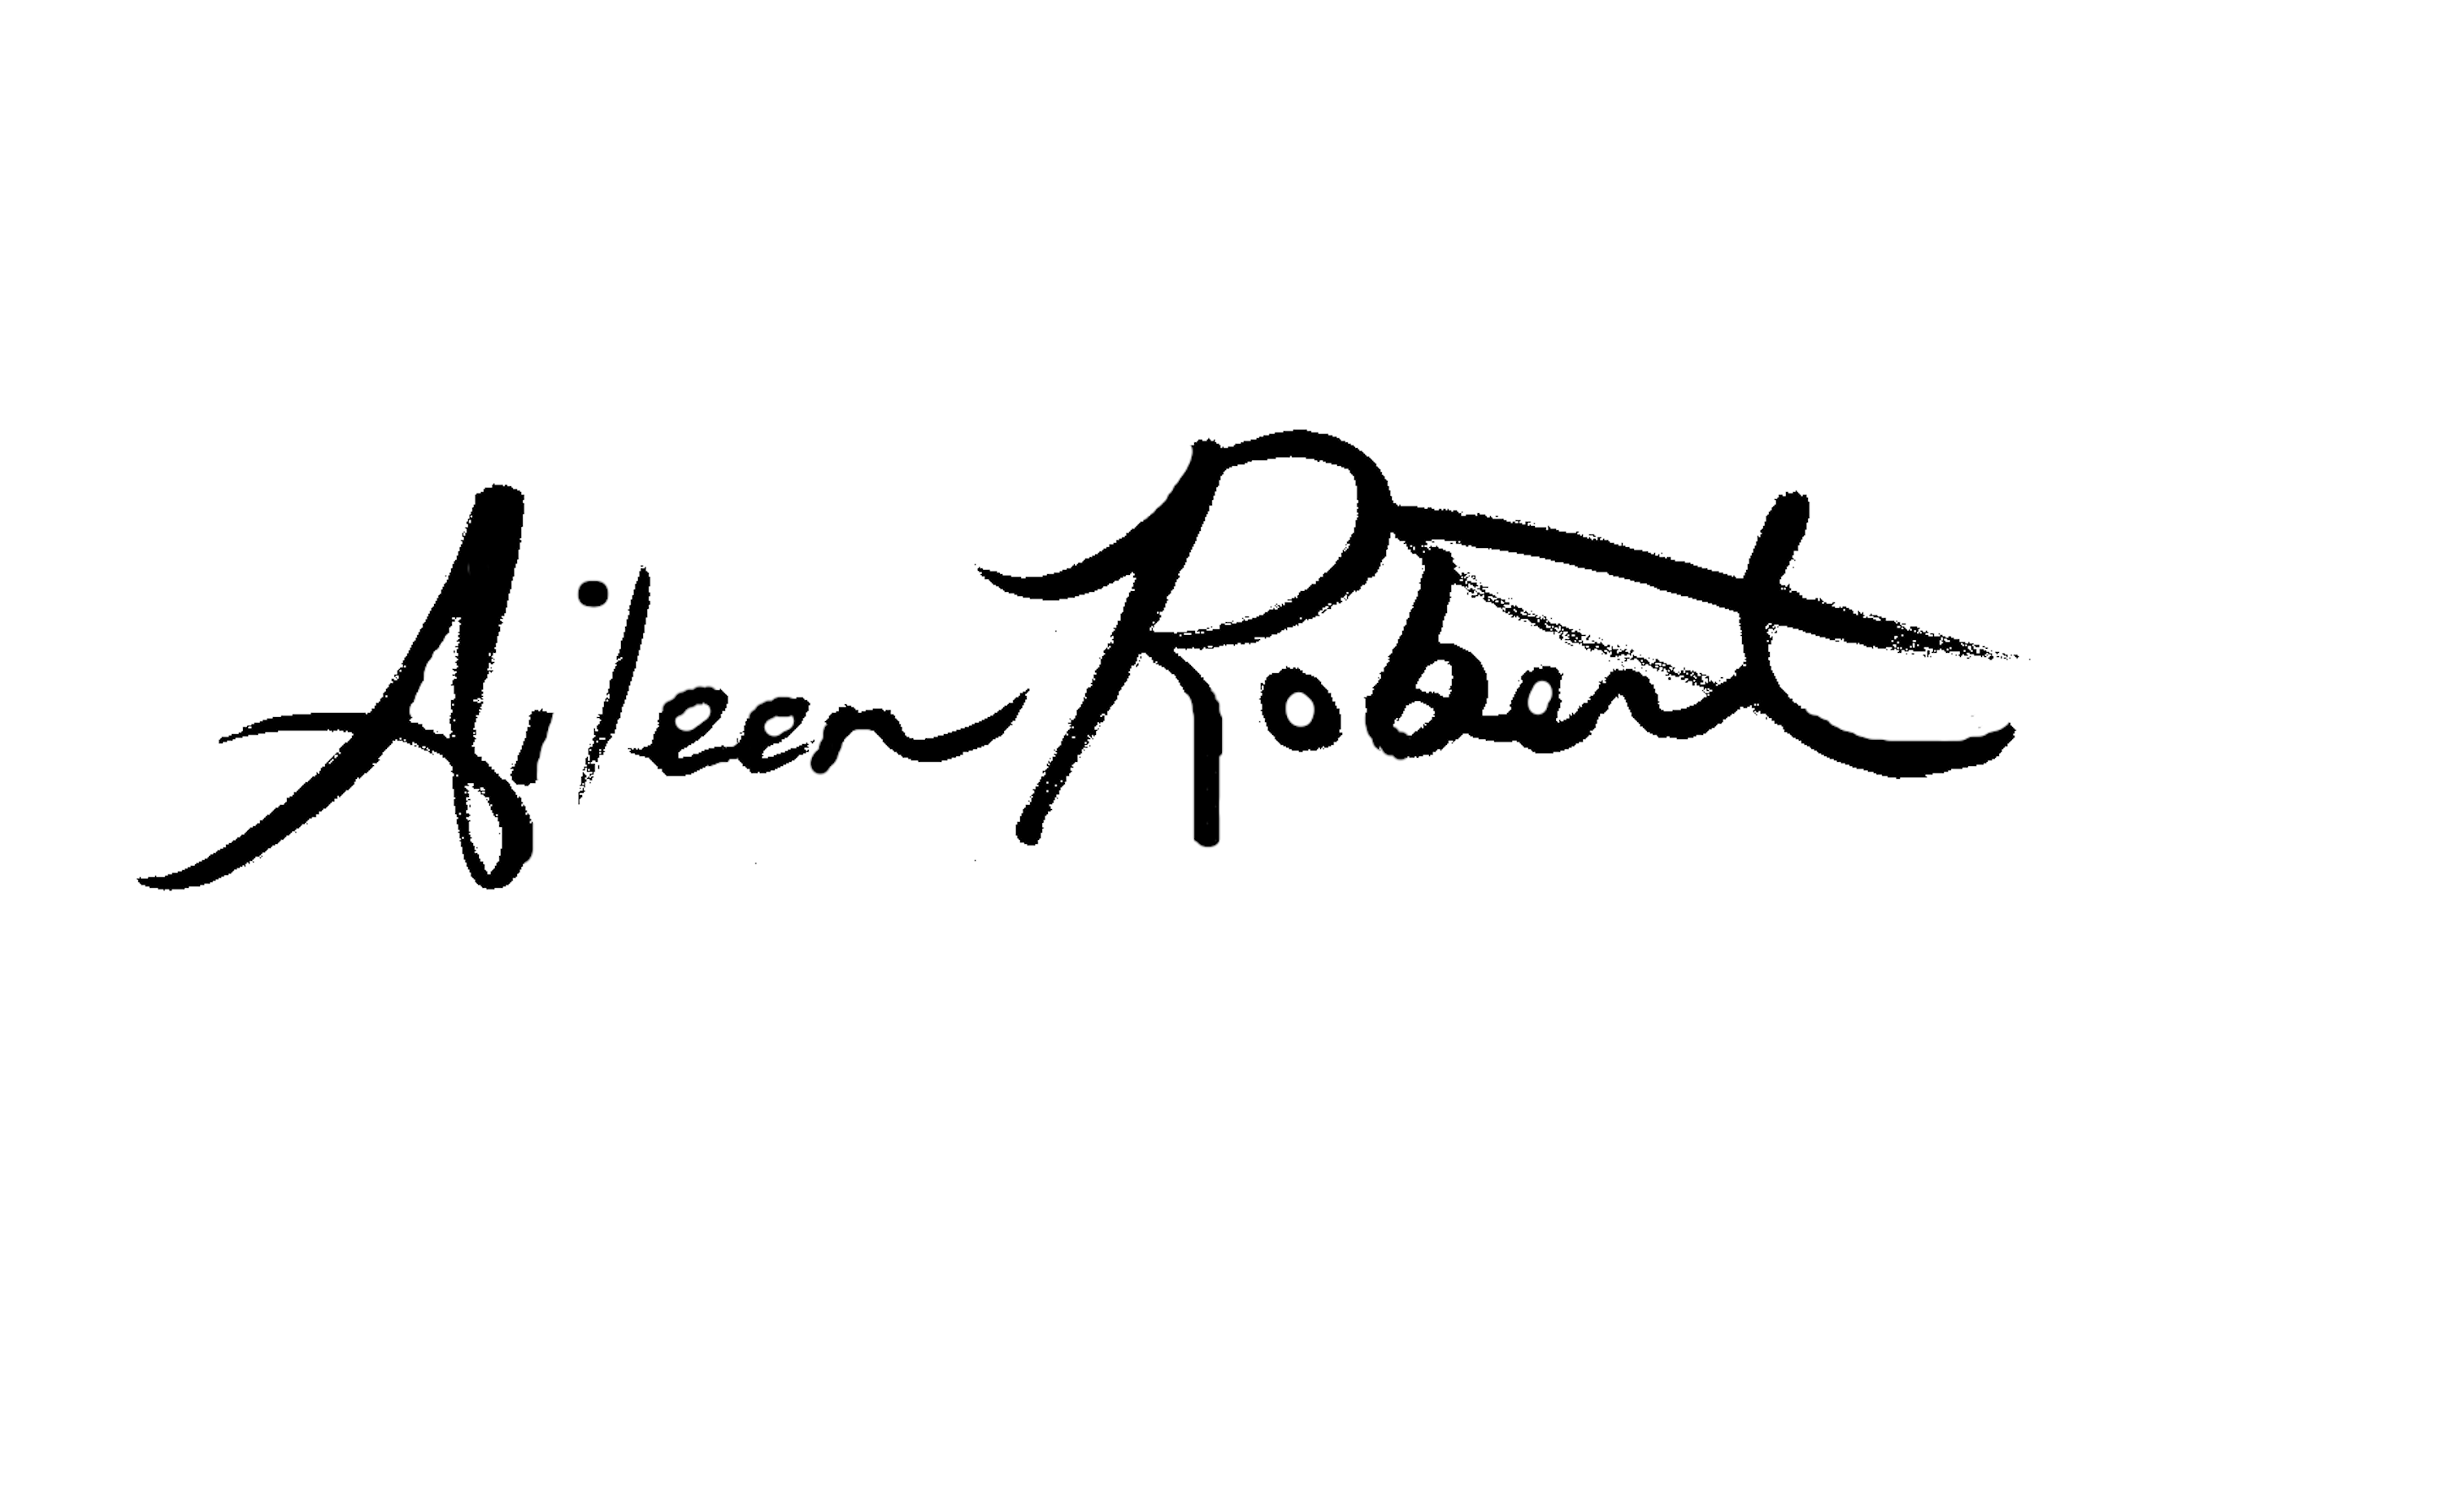 Aileen Roberts's Signature